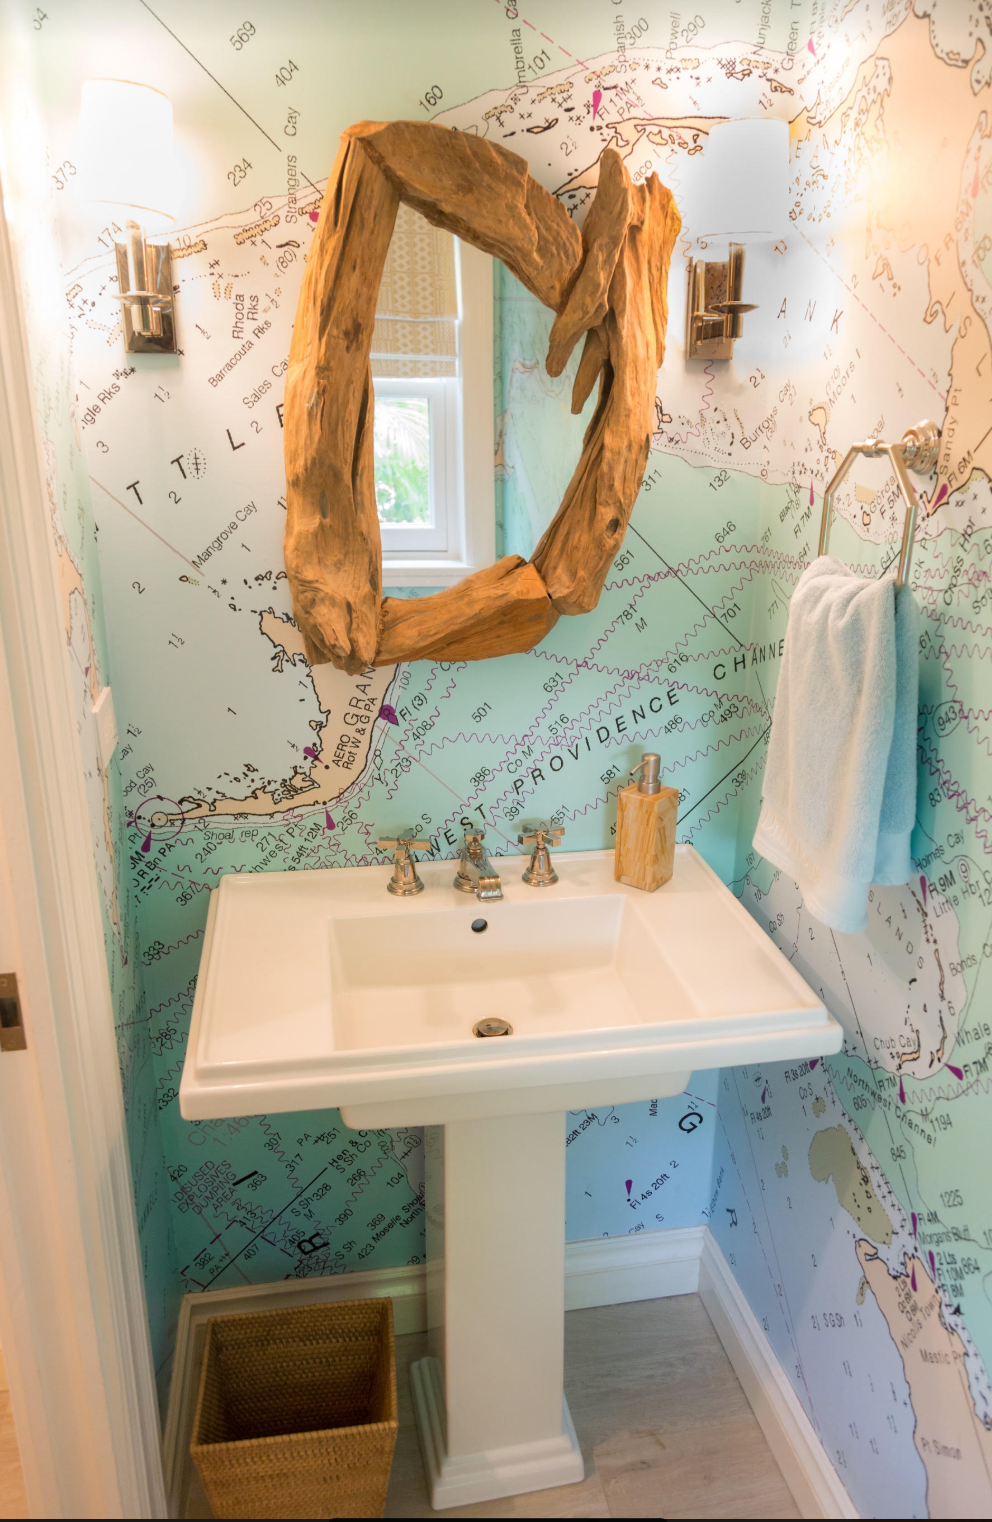 Kerry Sullivan - Bathroom.PNG